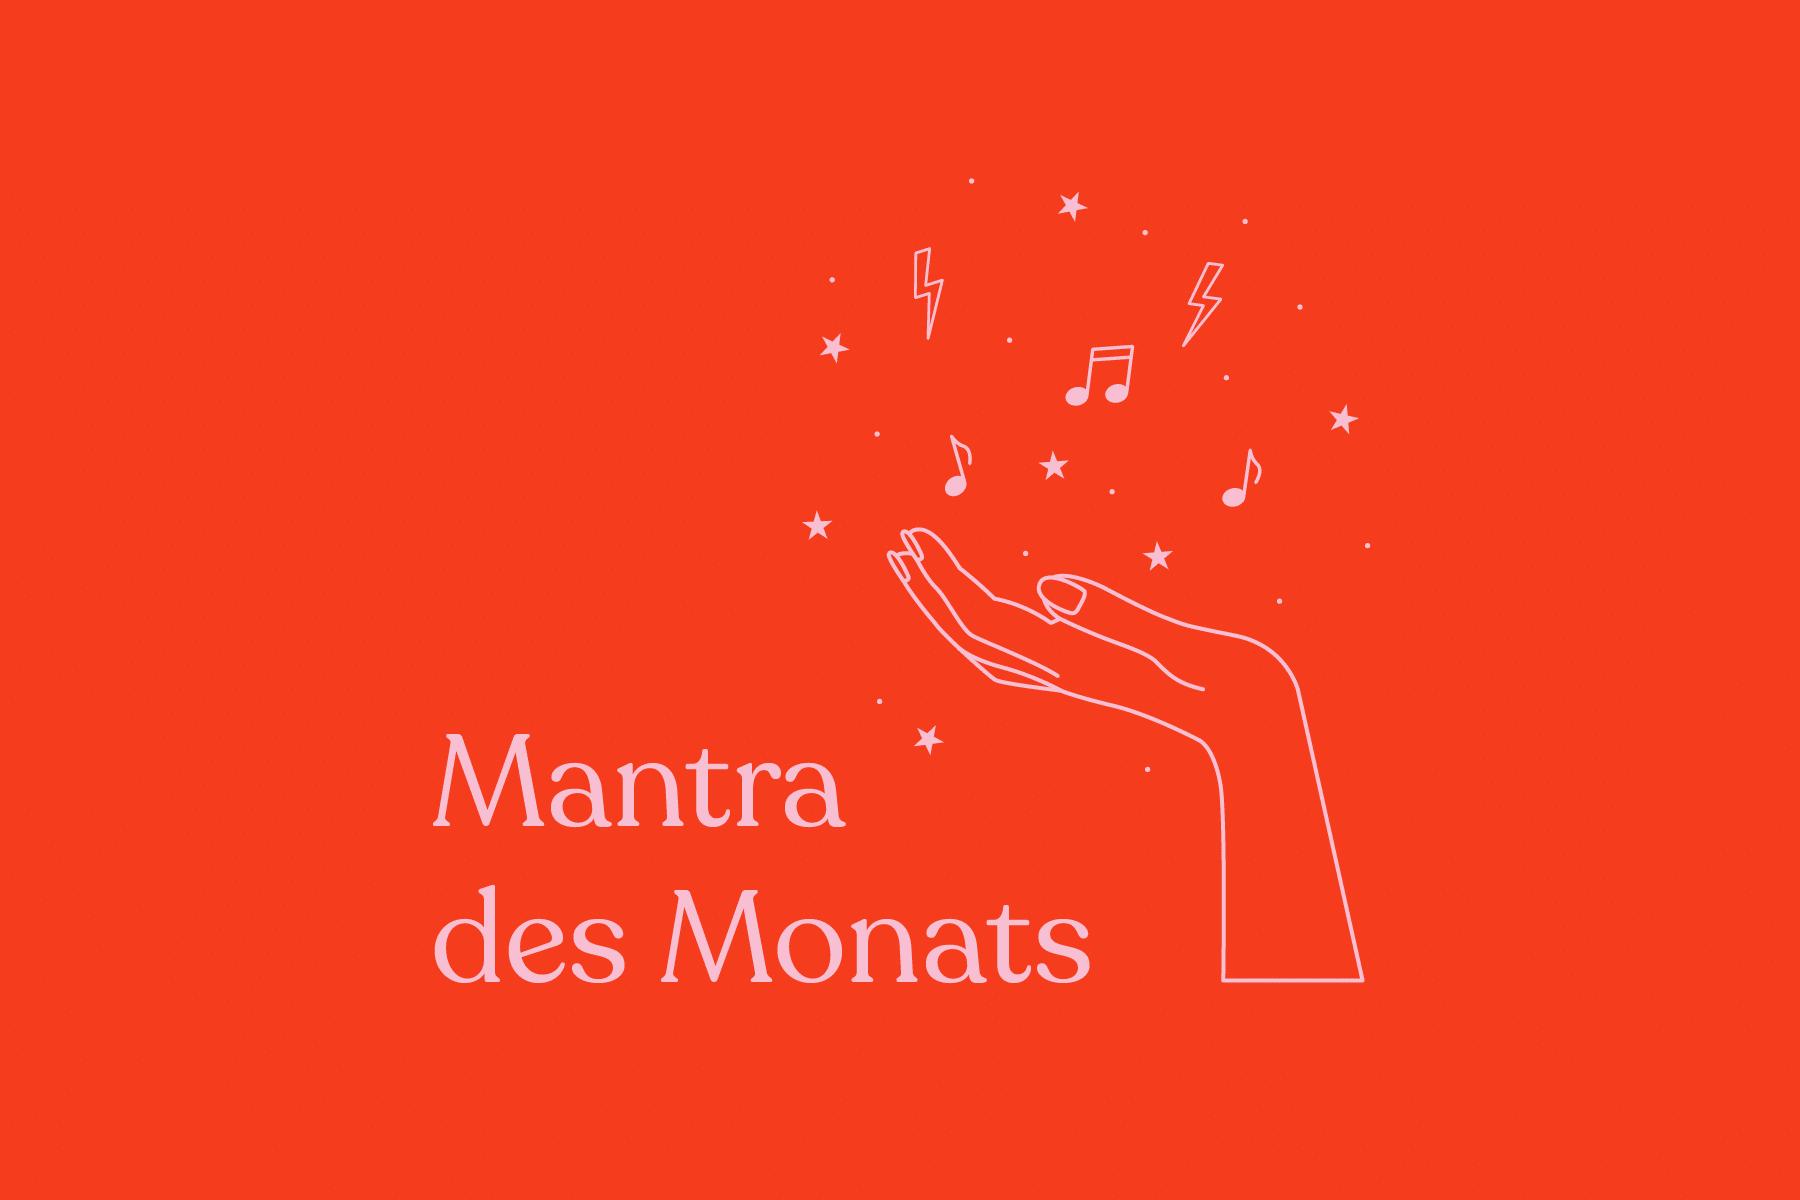 mantra-ra-ma-da-sa-meditation